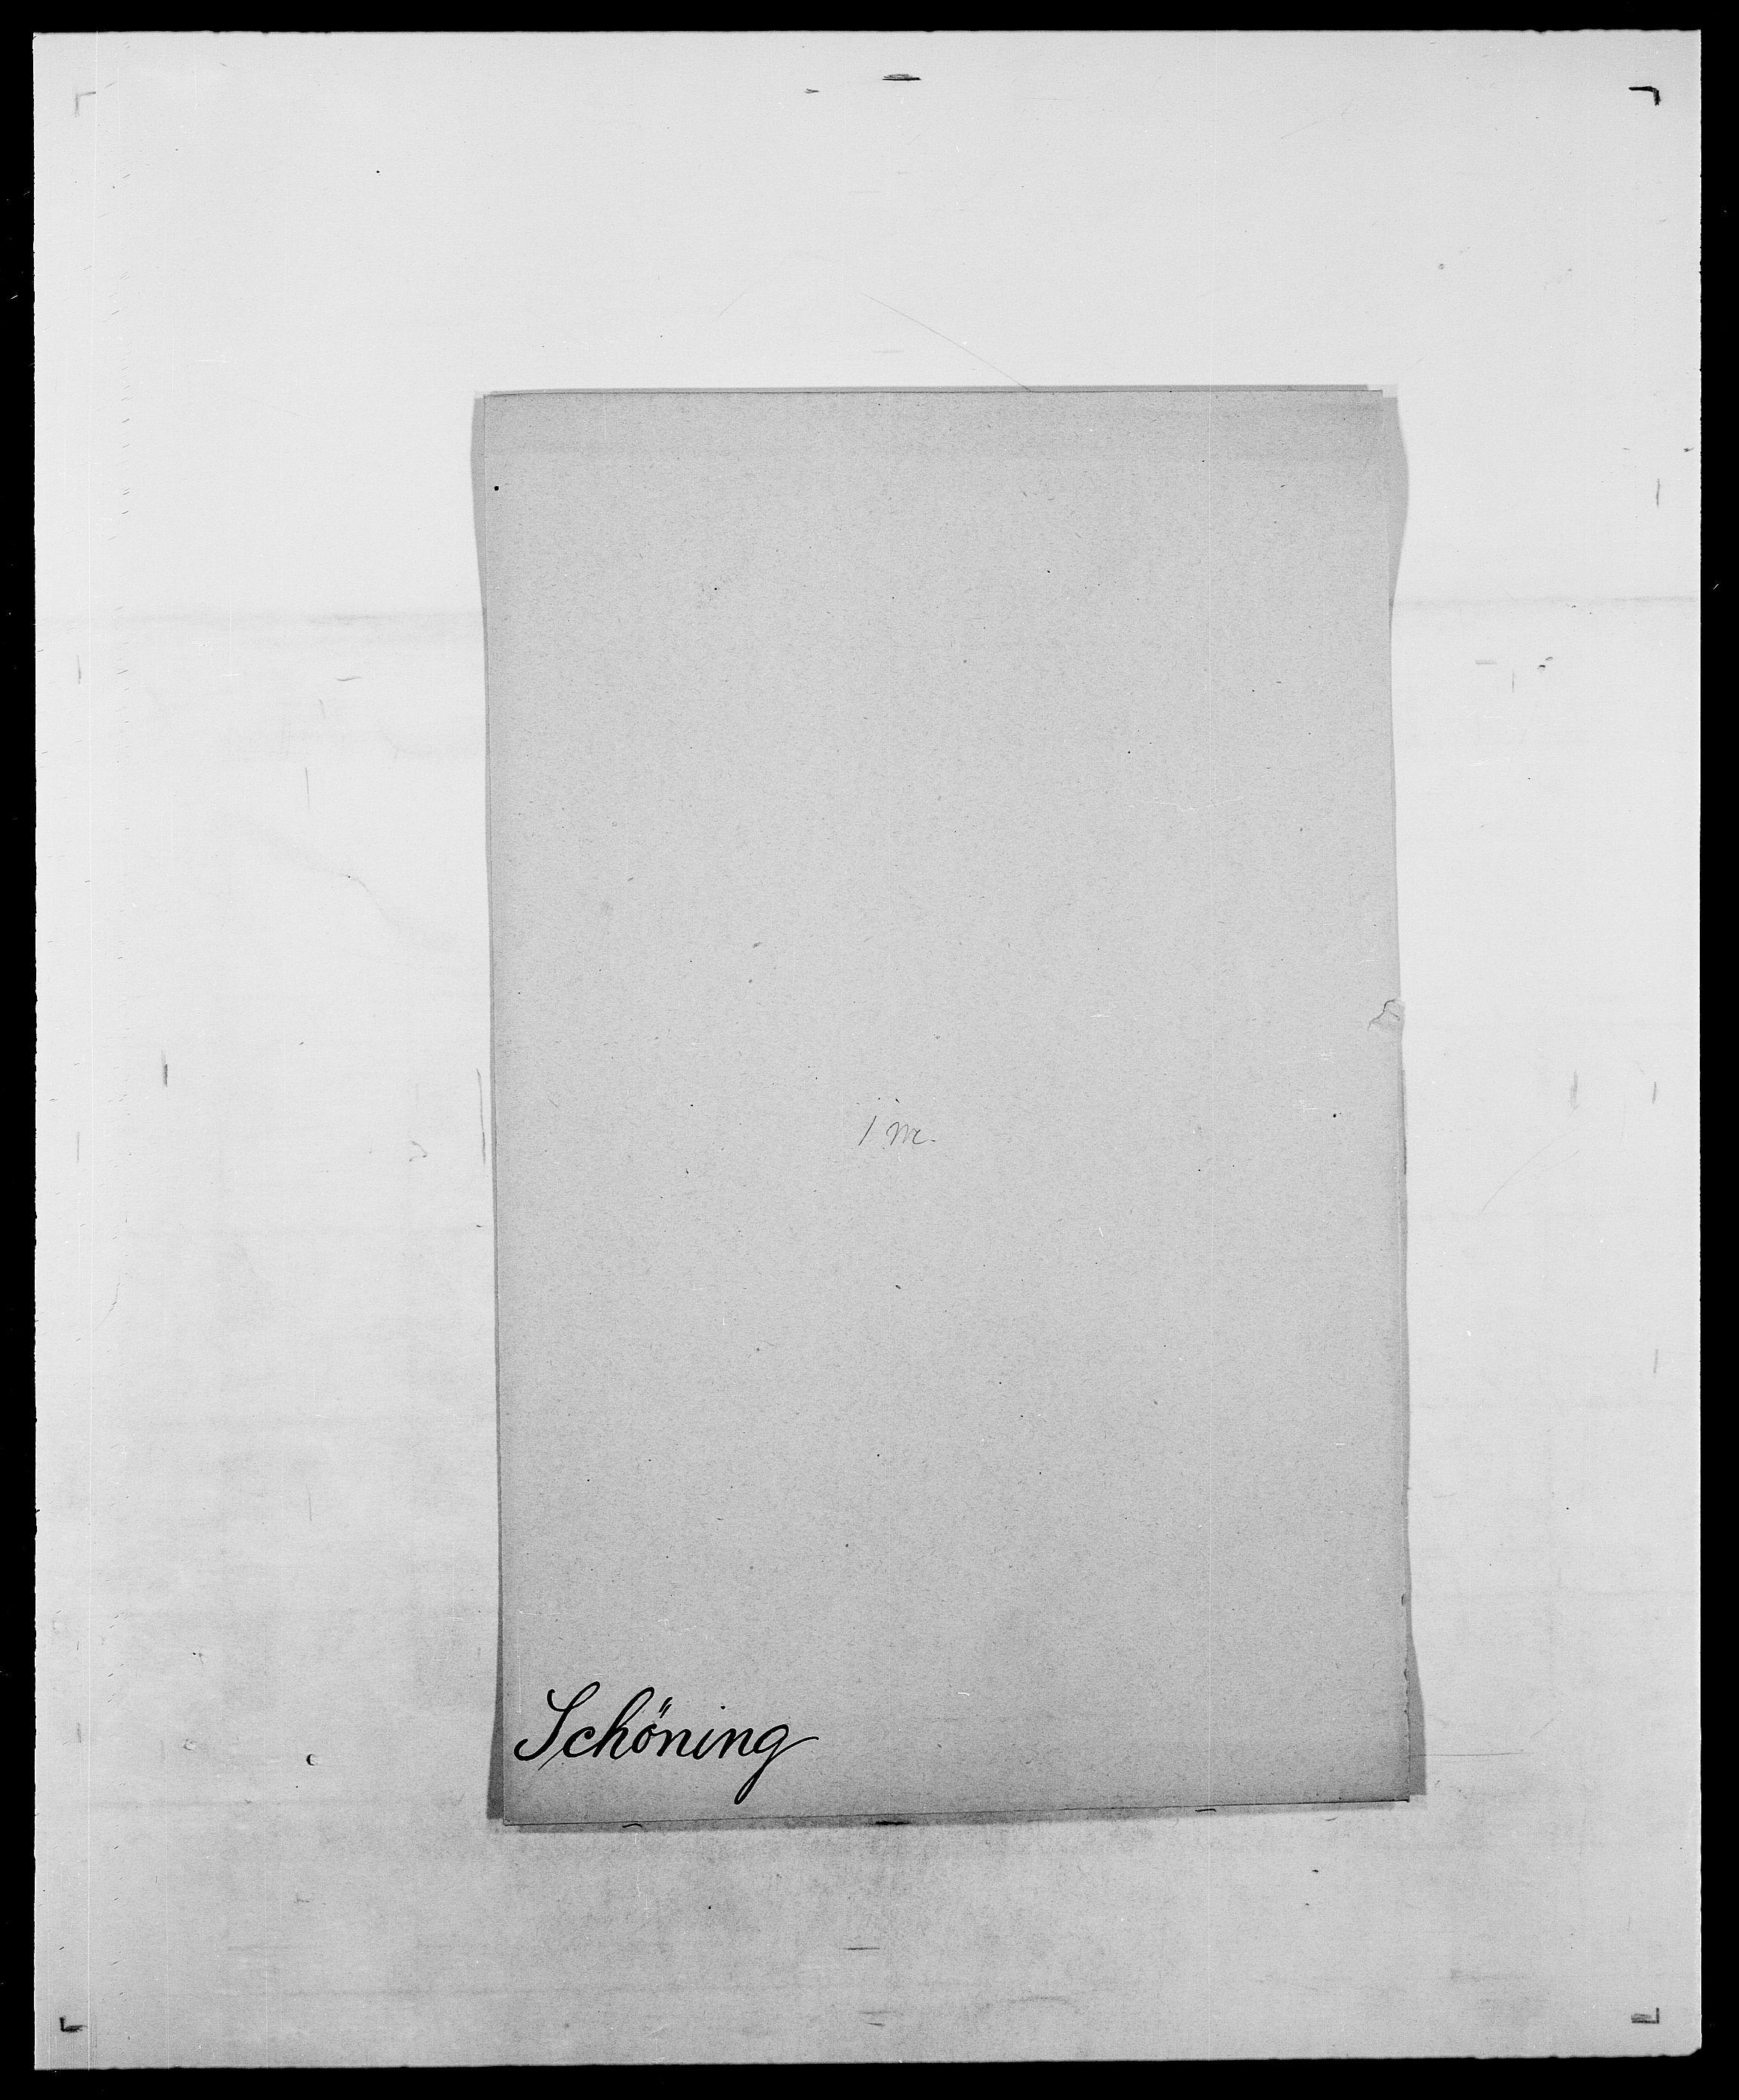 SAO, Delgobe, Charles Antoine - samling, D/Da/L0035: Schnabel - sjetman, s. 496